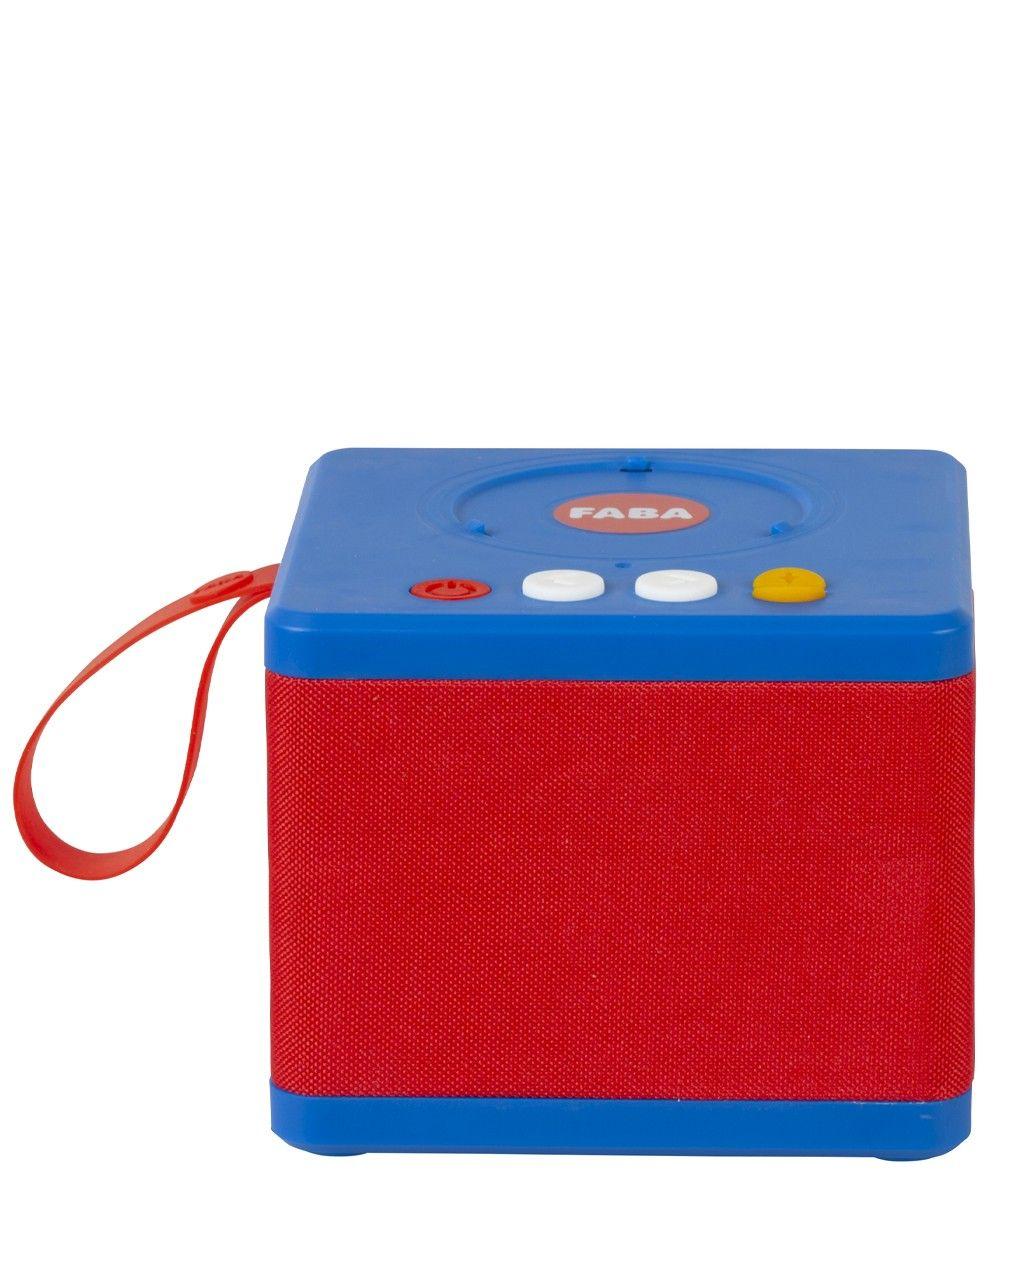 Faba - raccontastorie - starter set - blu - Faba